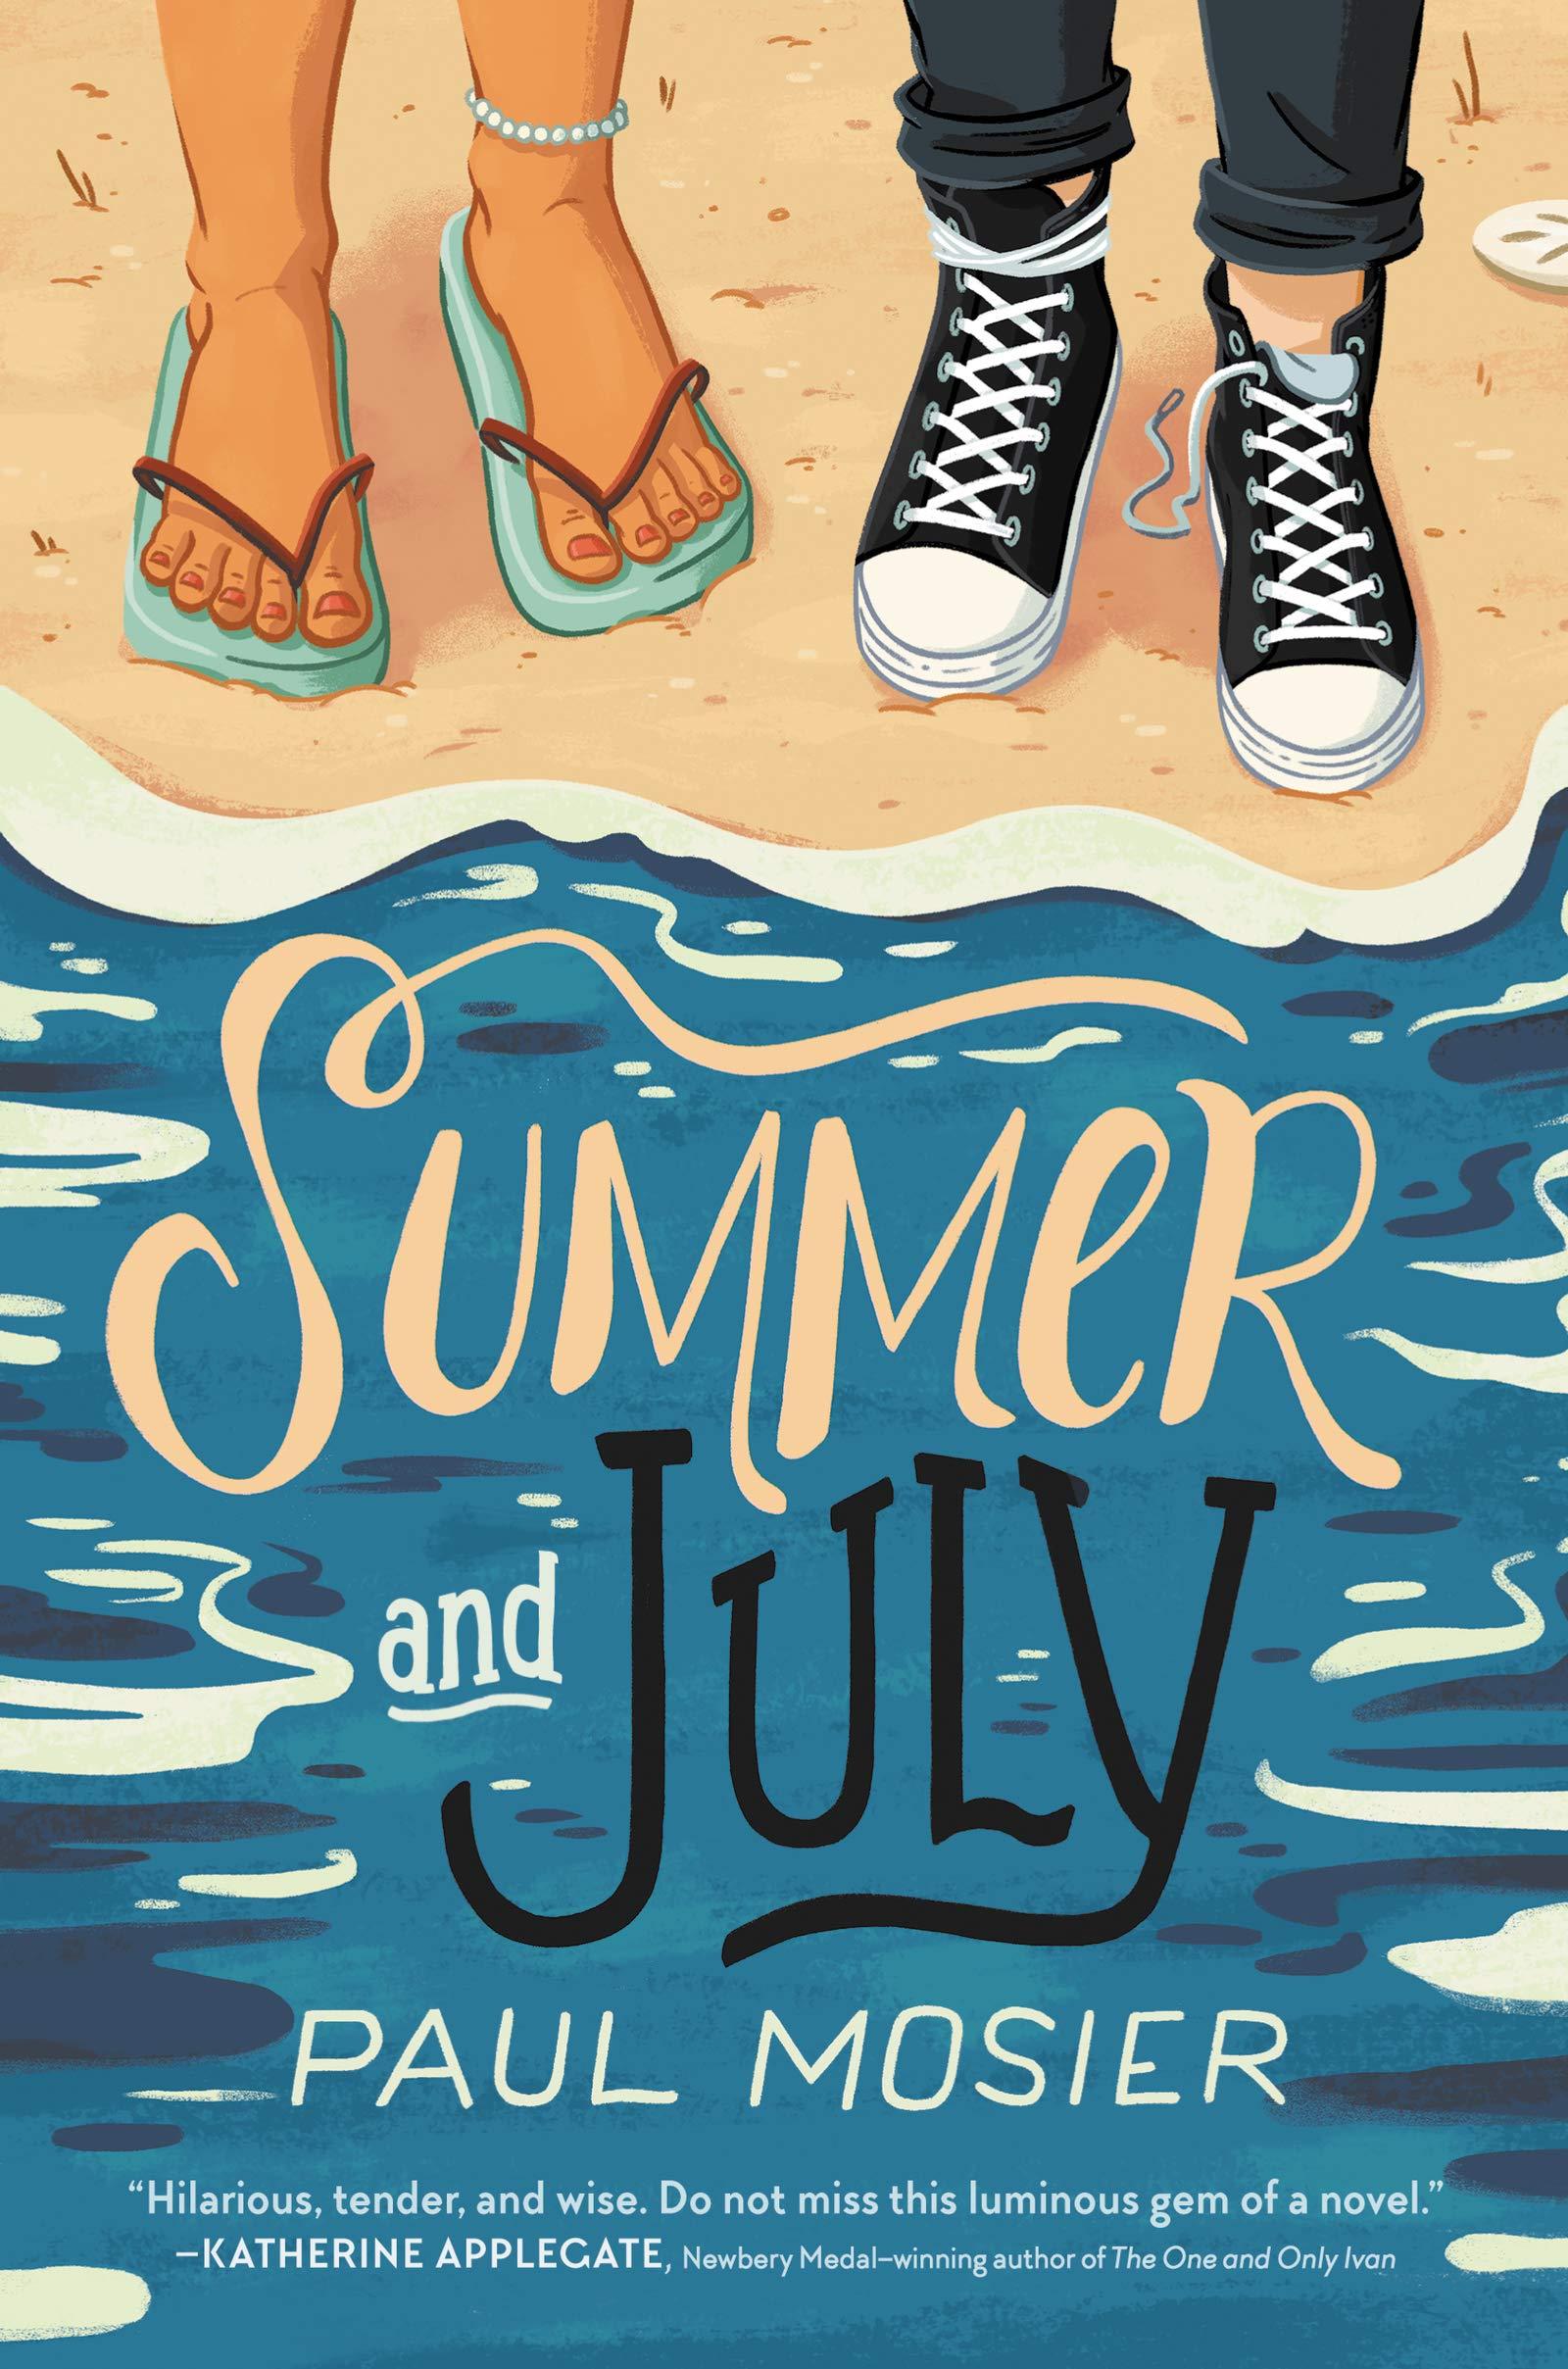 HarperCollins (June 9, 2020)